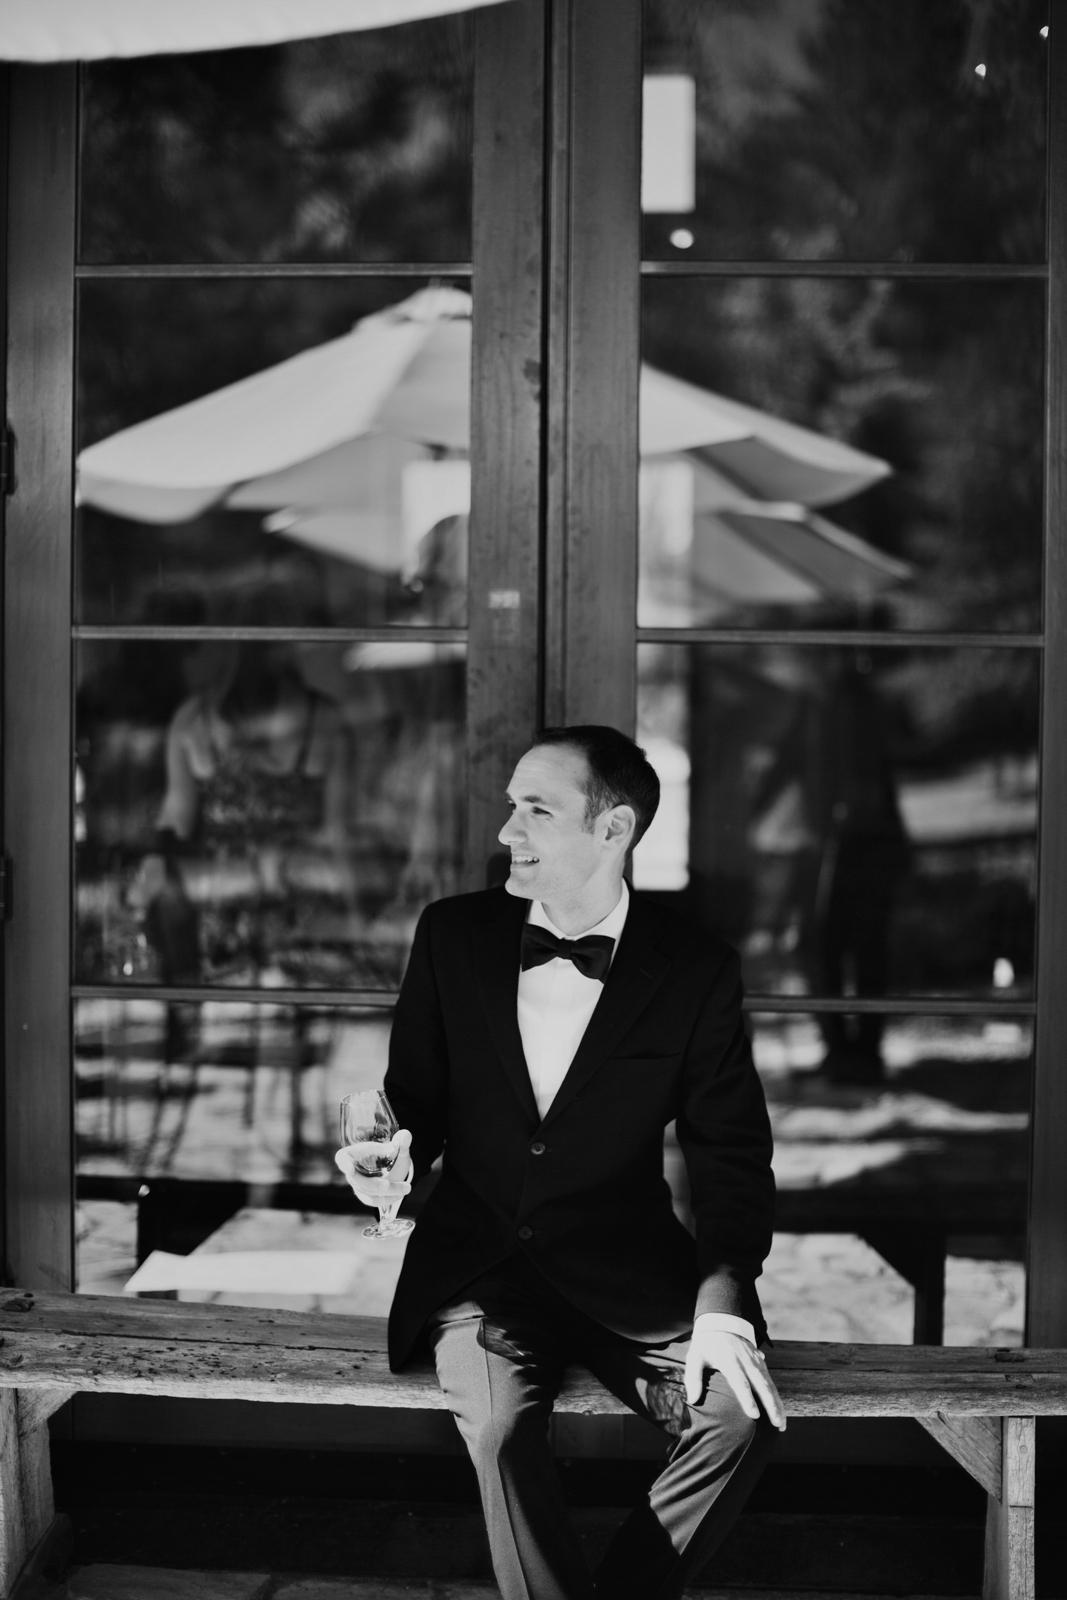 miraflores_winery_wedding_photography_ian_melissa_ebony_siovhan_bokeh_photography_02.jpg